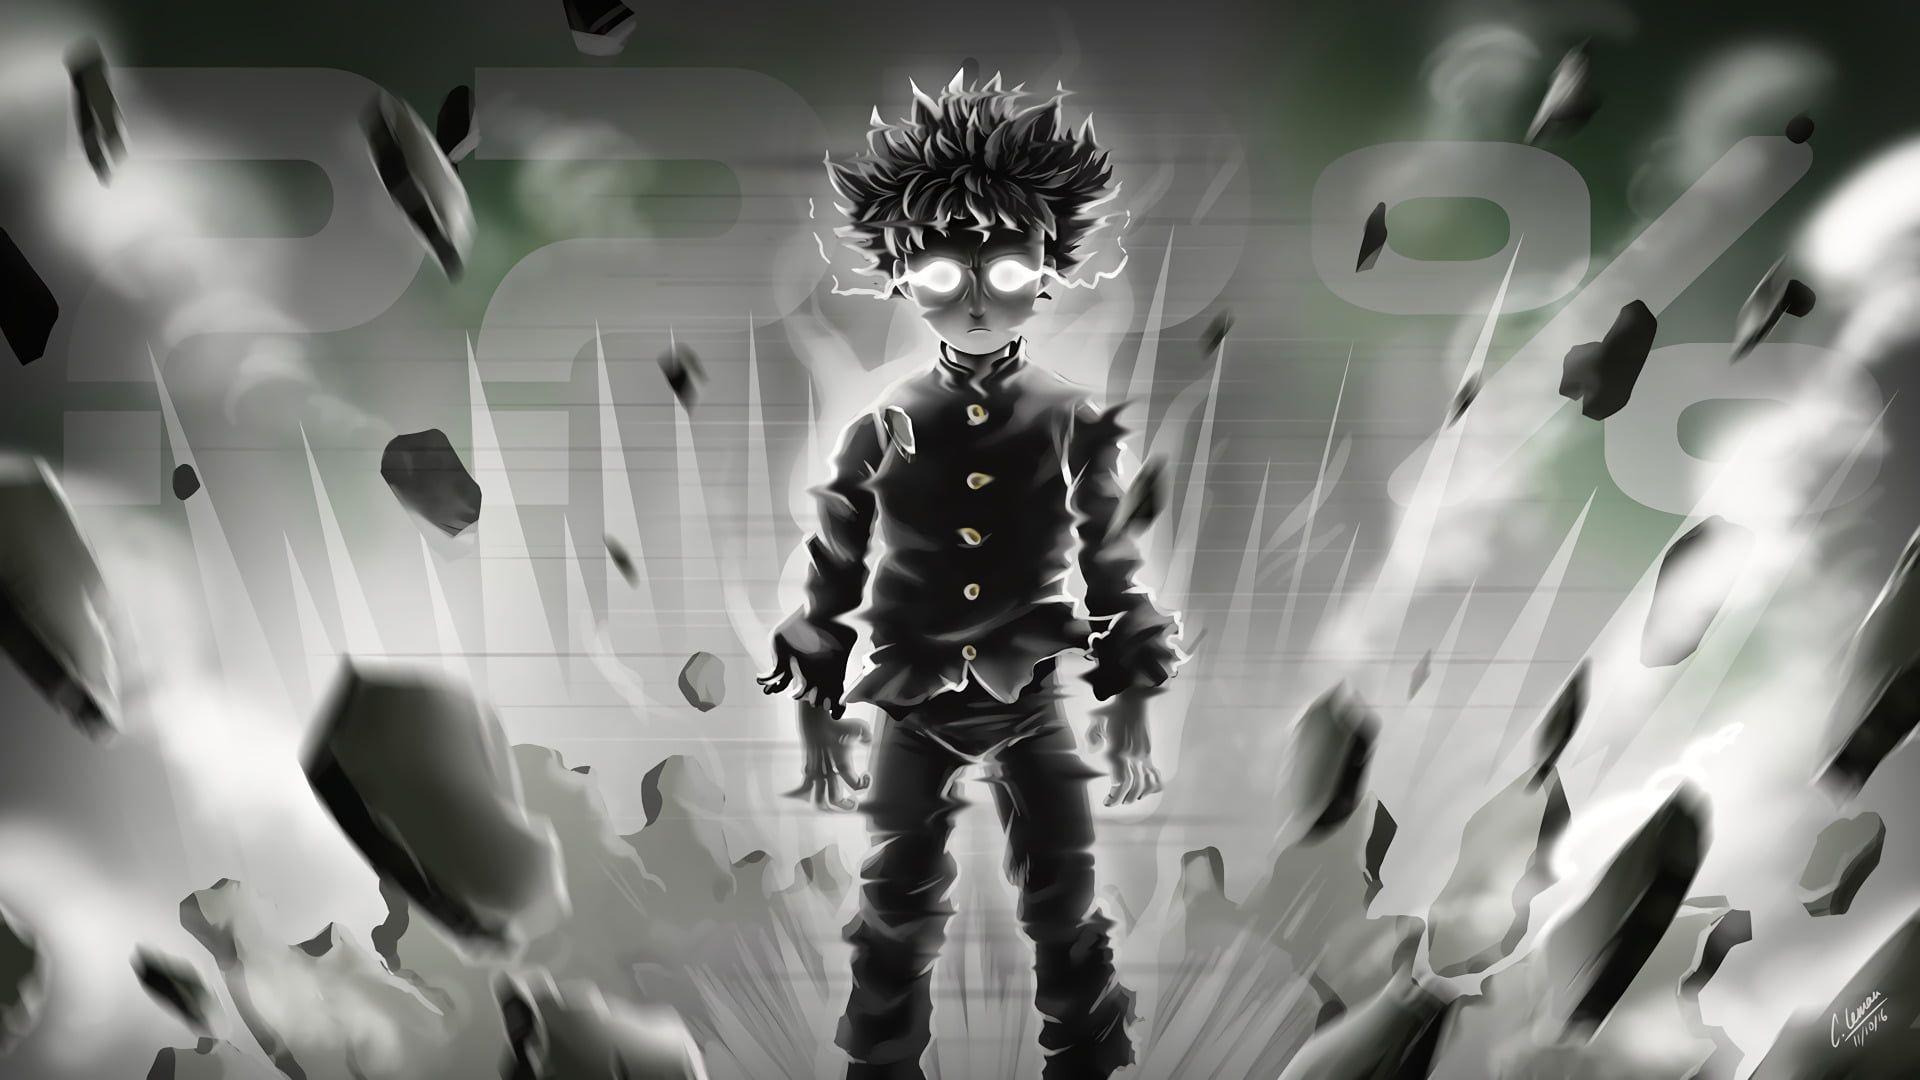 Mob Psycho 100 digital wallpaper Anime Mob Psycho 100